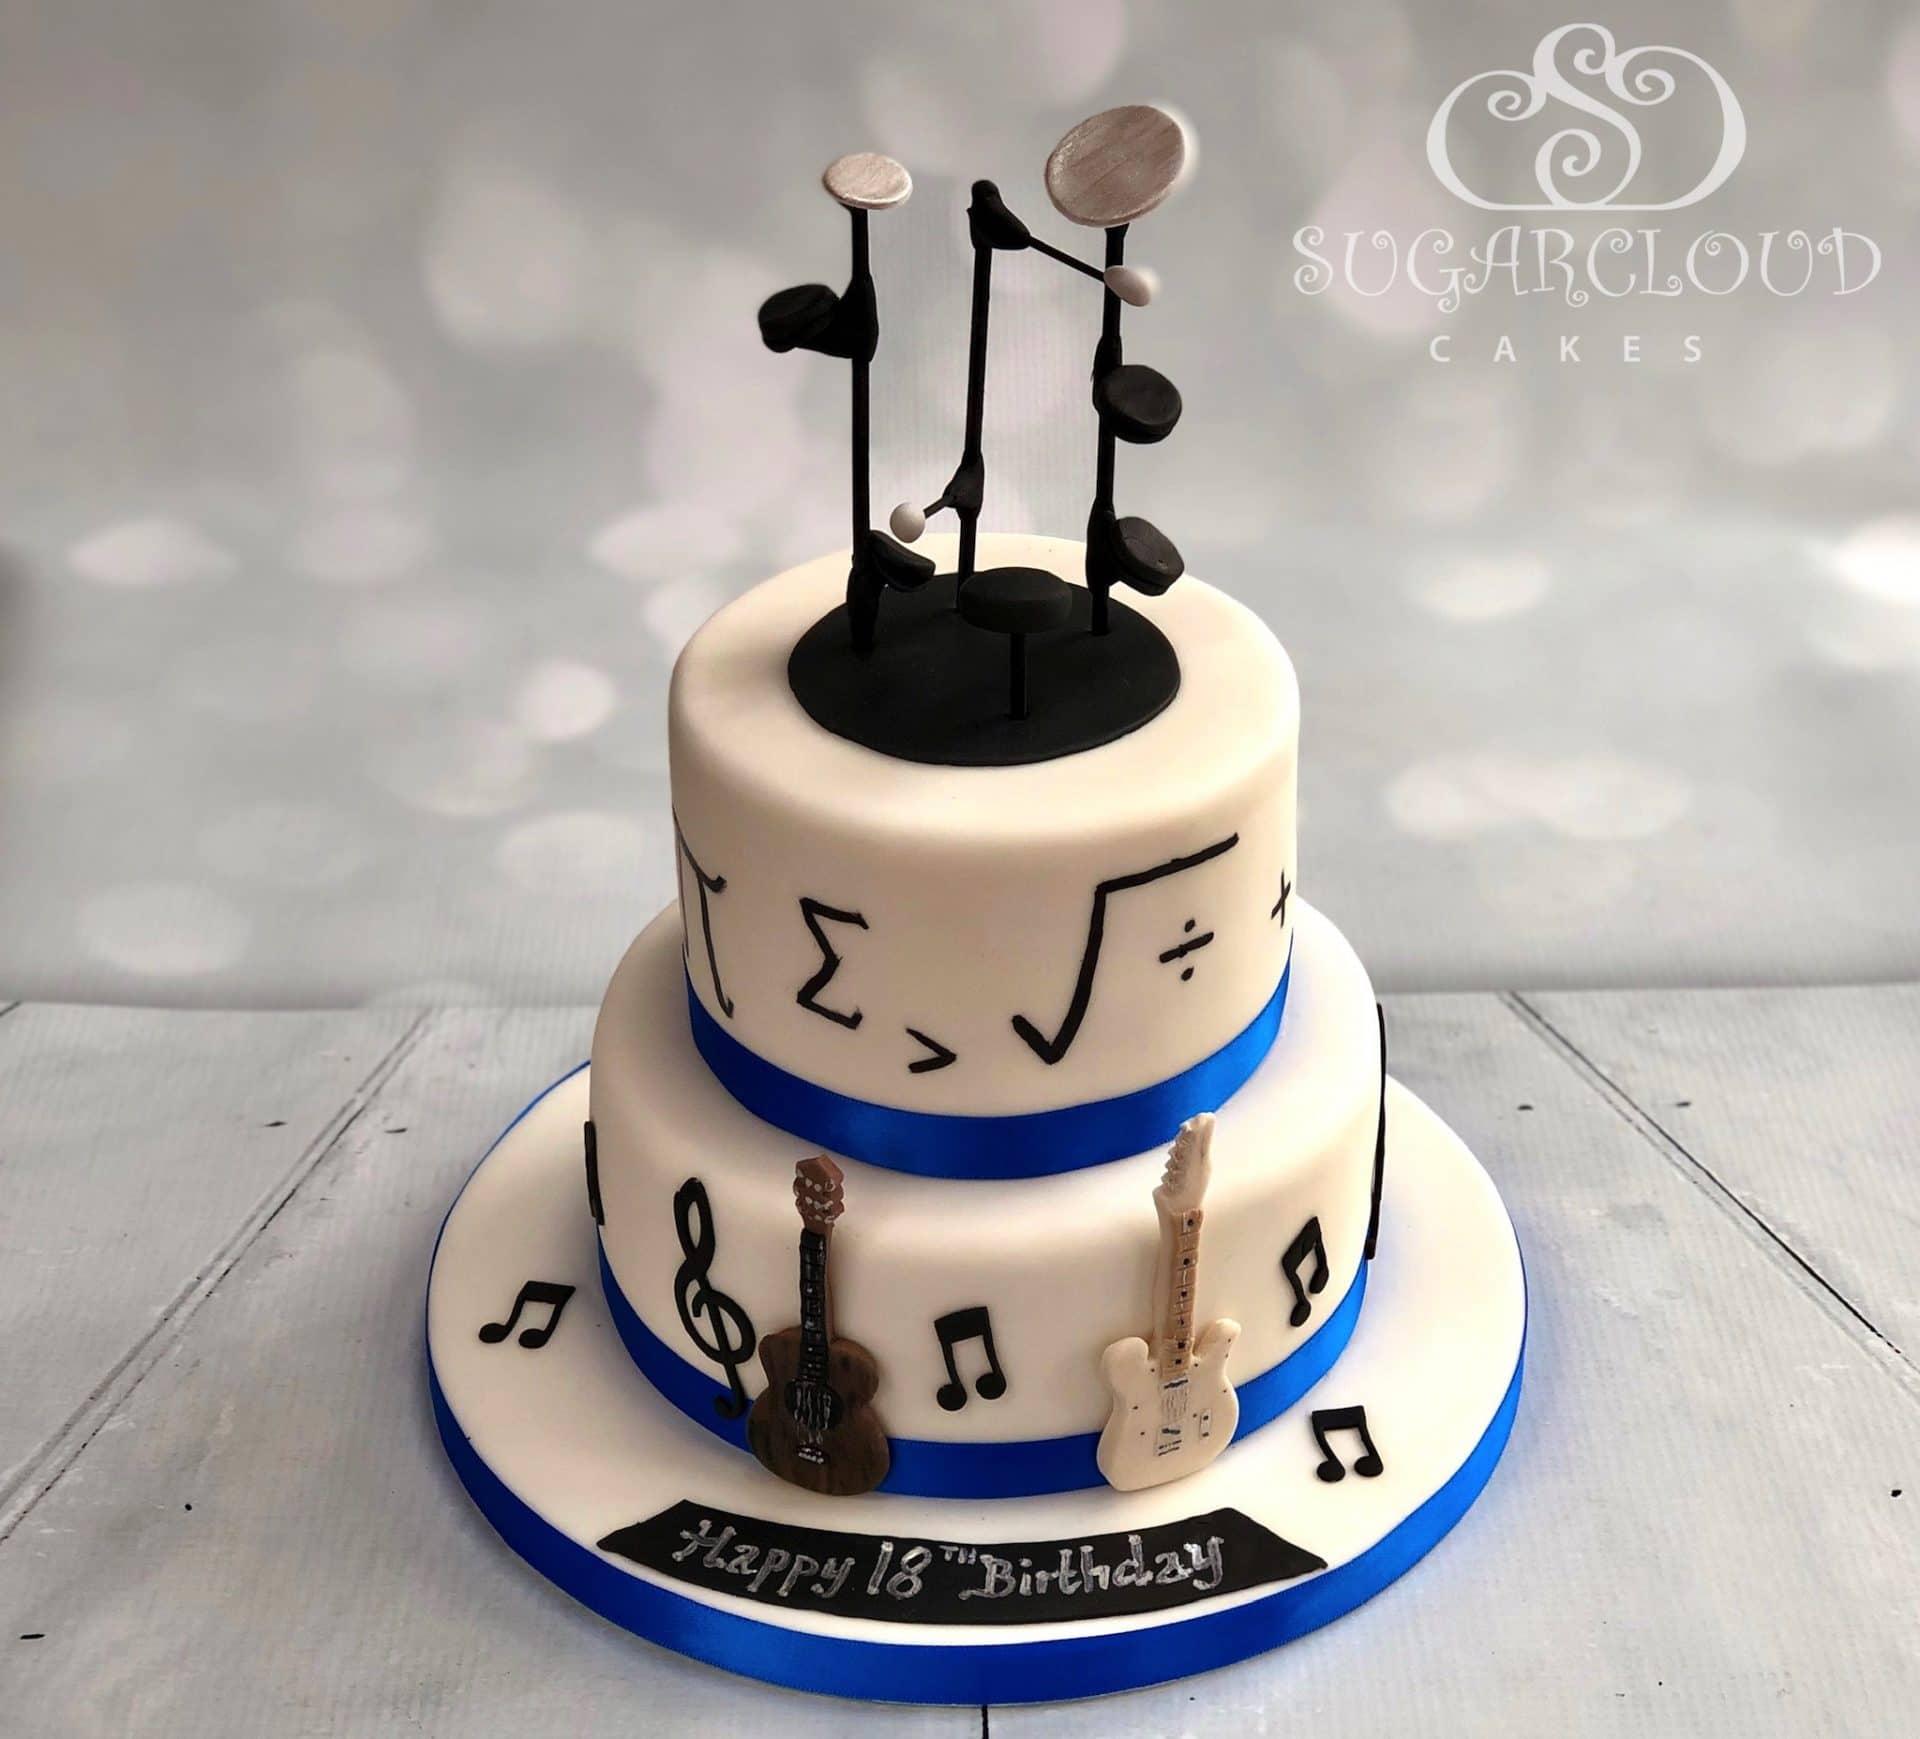 Miraculous Sugar Cloud Cakes Cake Designer Haslington Crewe Cheshire A Personalised Birthday Cards Petedlily Jamesorg